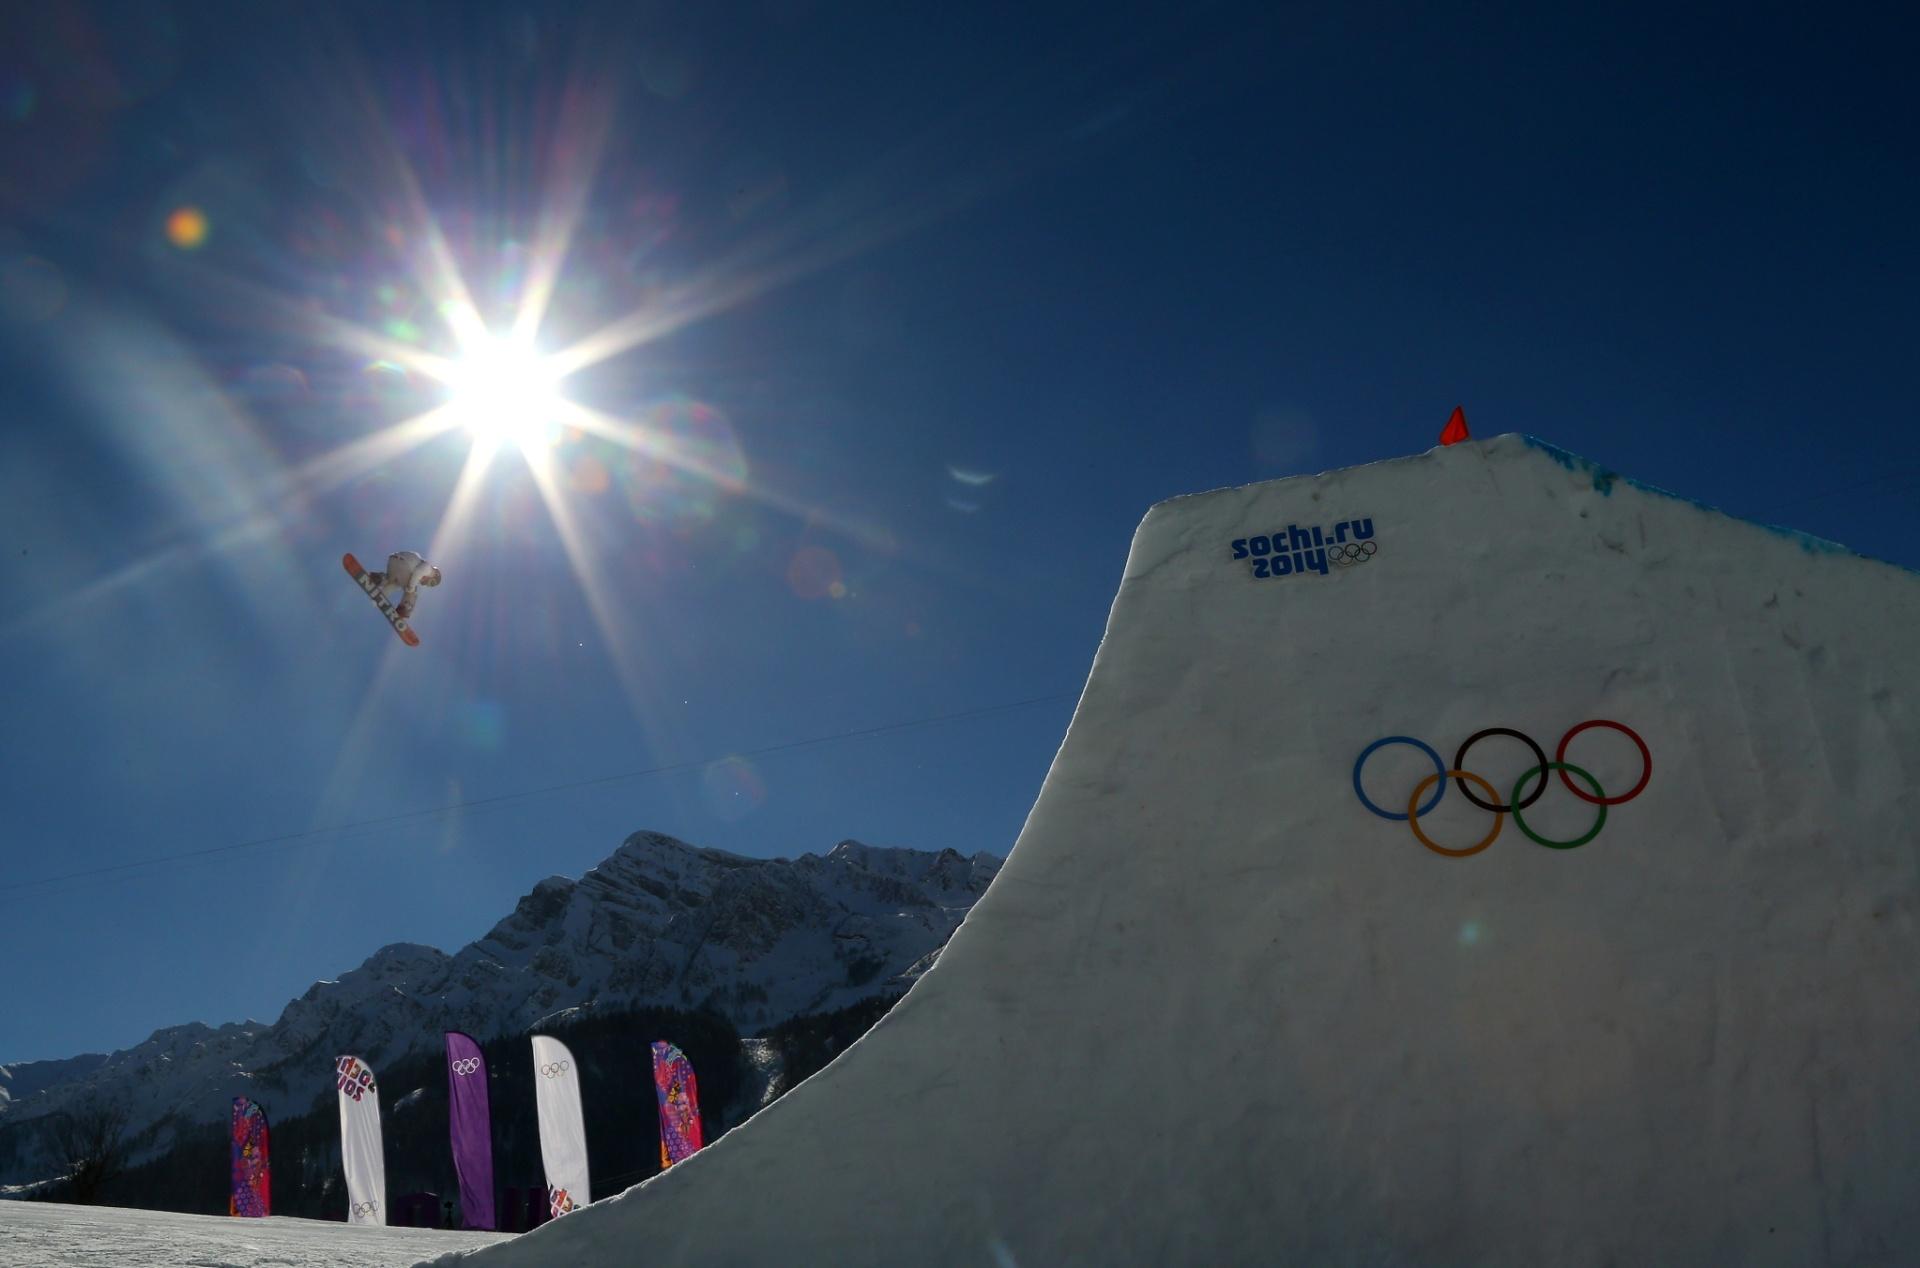 09.02.2014 - Sol ofusca imagem do sueco Sven Thorgren, do snowboard slopestyle